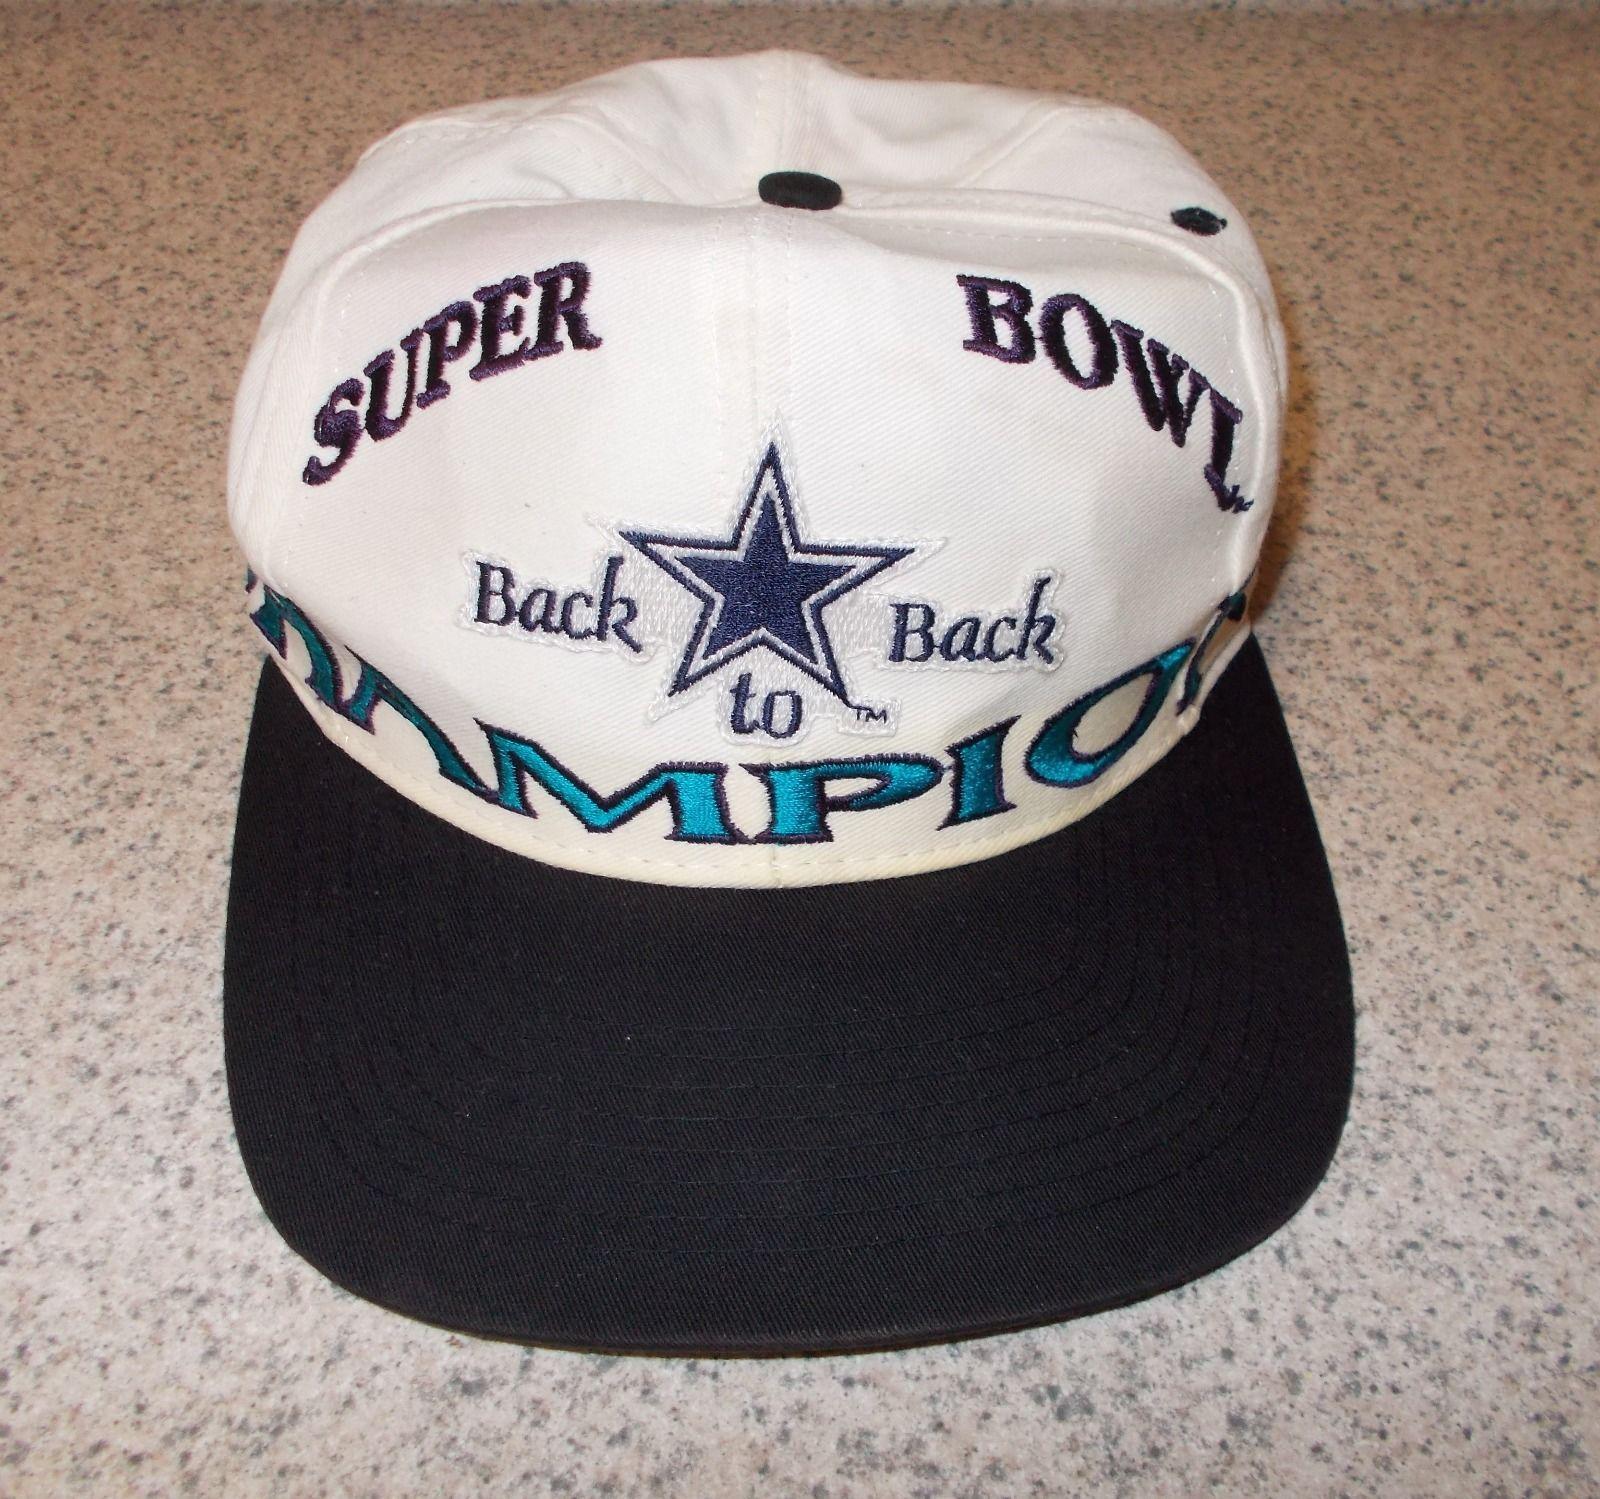 Dallas Cowboys Superbowl Champions LOGO 7 Snapback Hat Cap Rare Vtg 90s NFL 4fc88b4c3